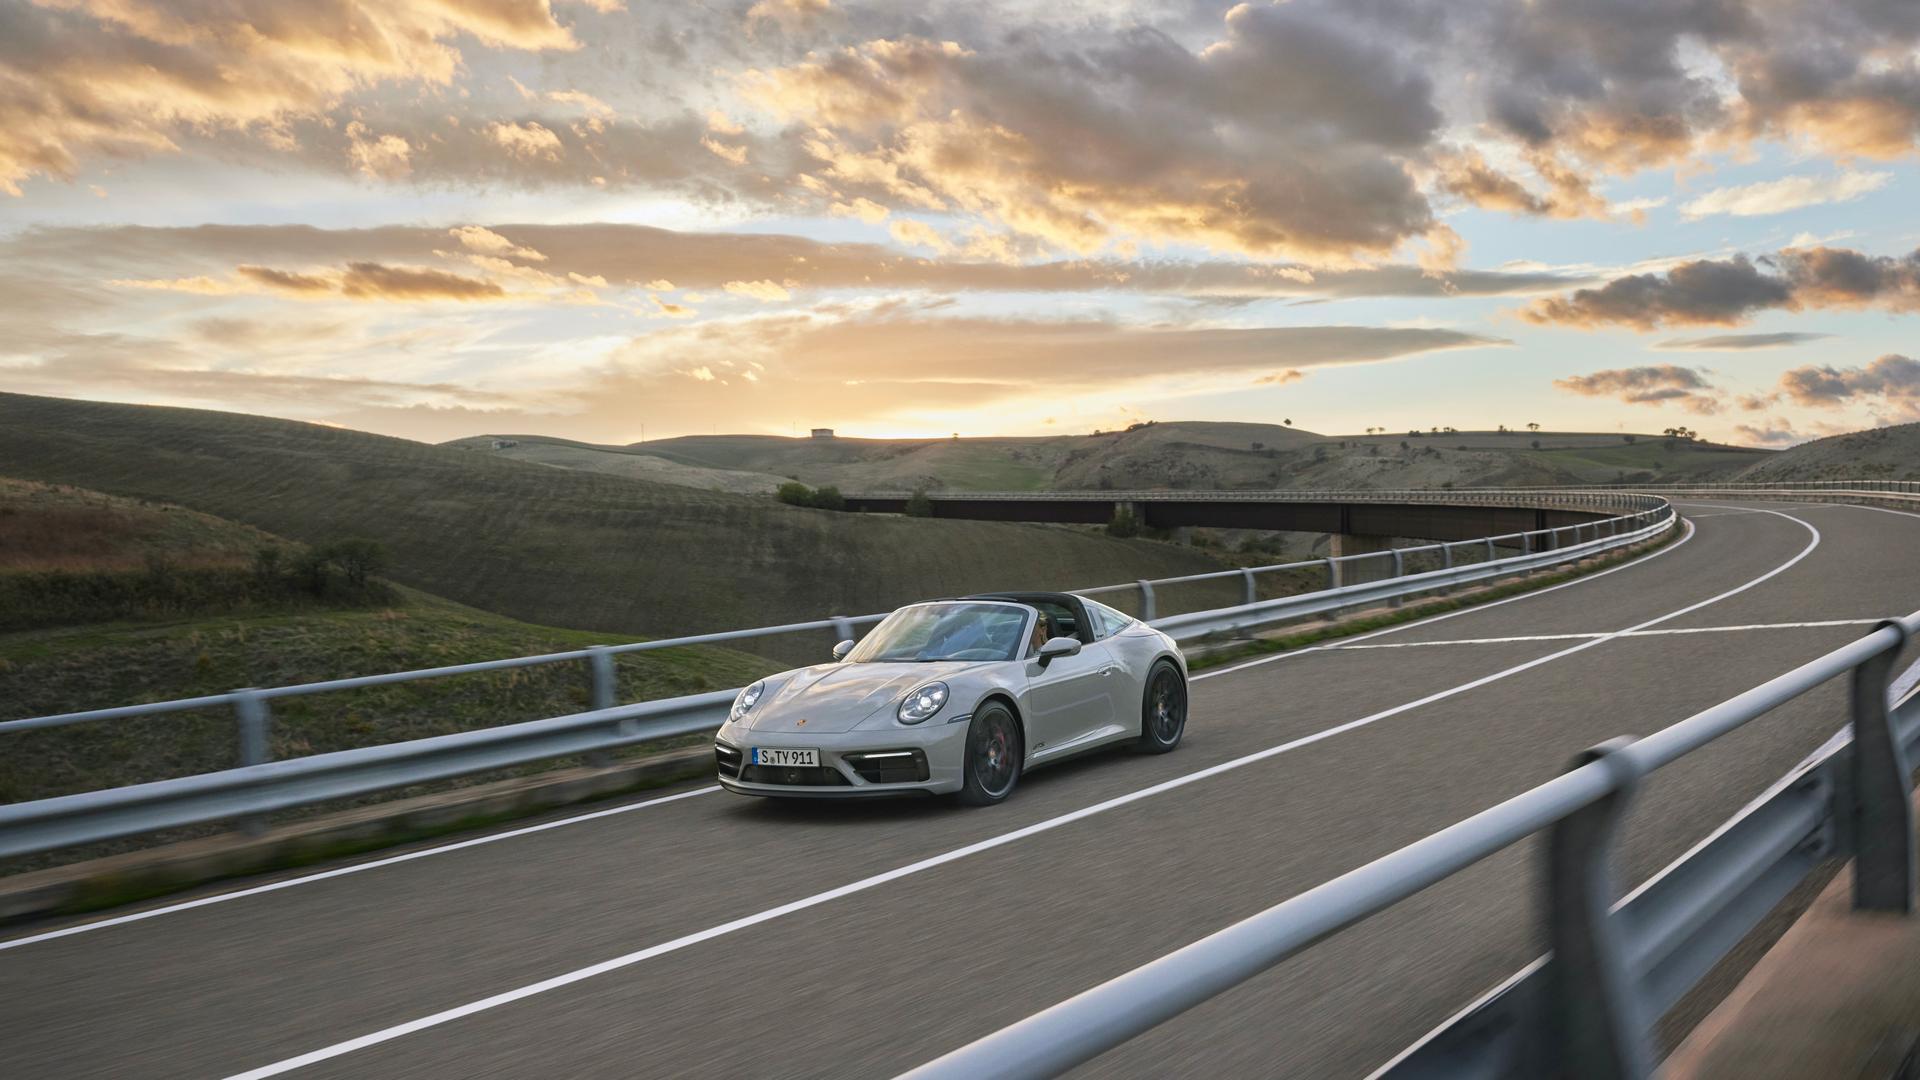 Porsche 911 GTS Convertible